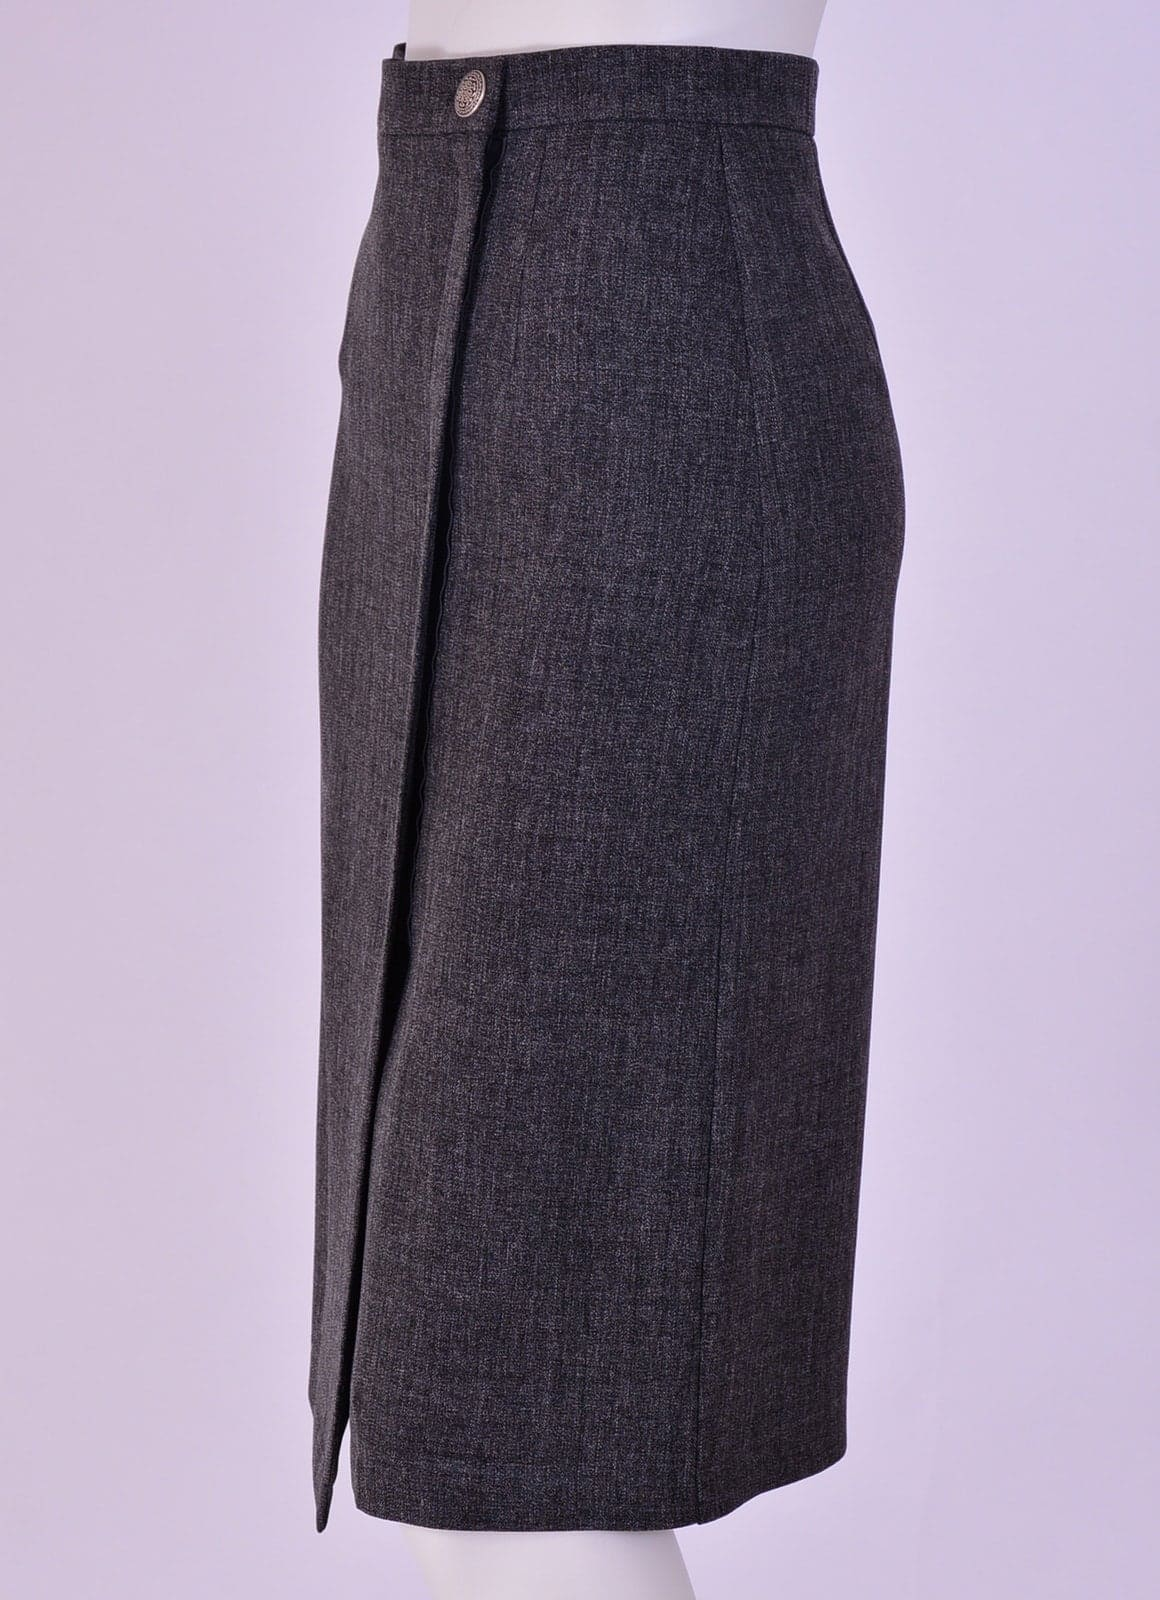 skirt-pencil-gray-liussy_47